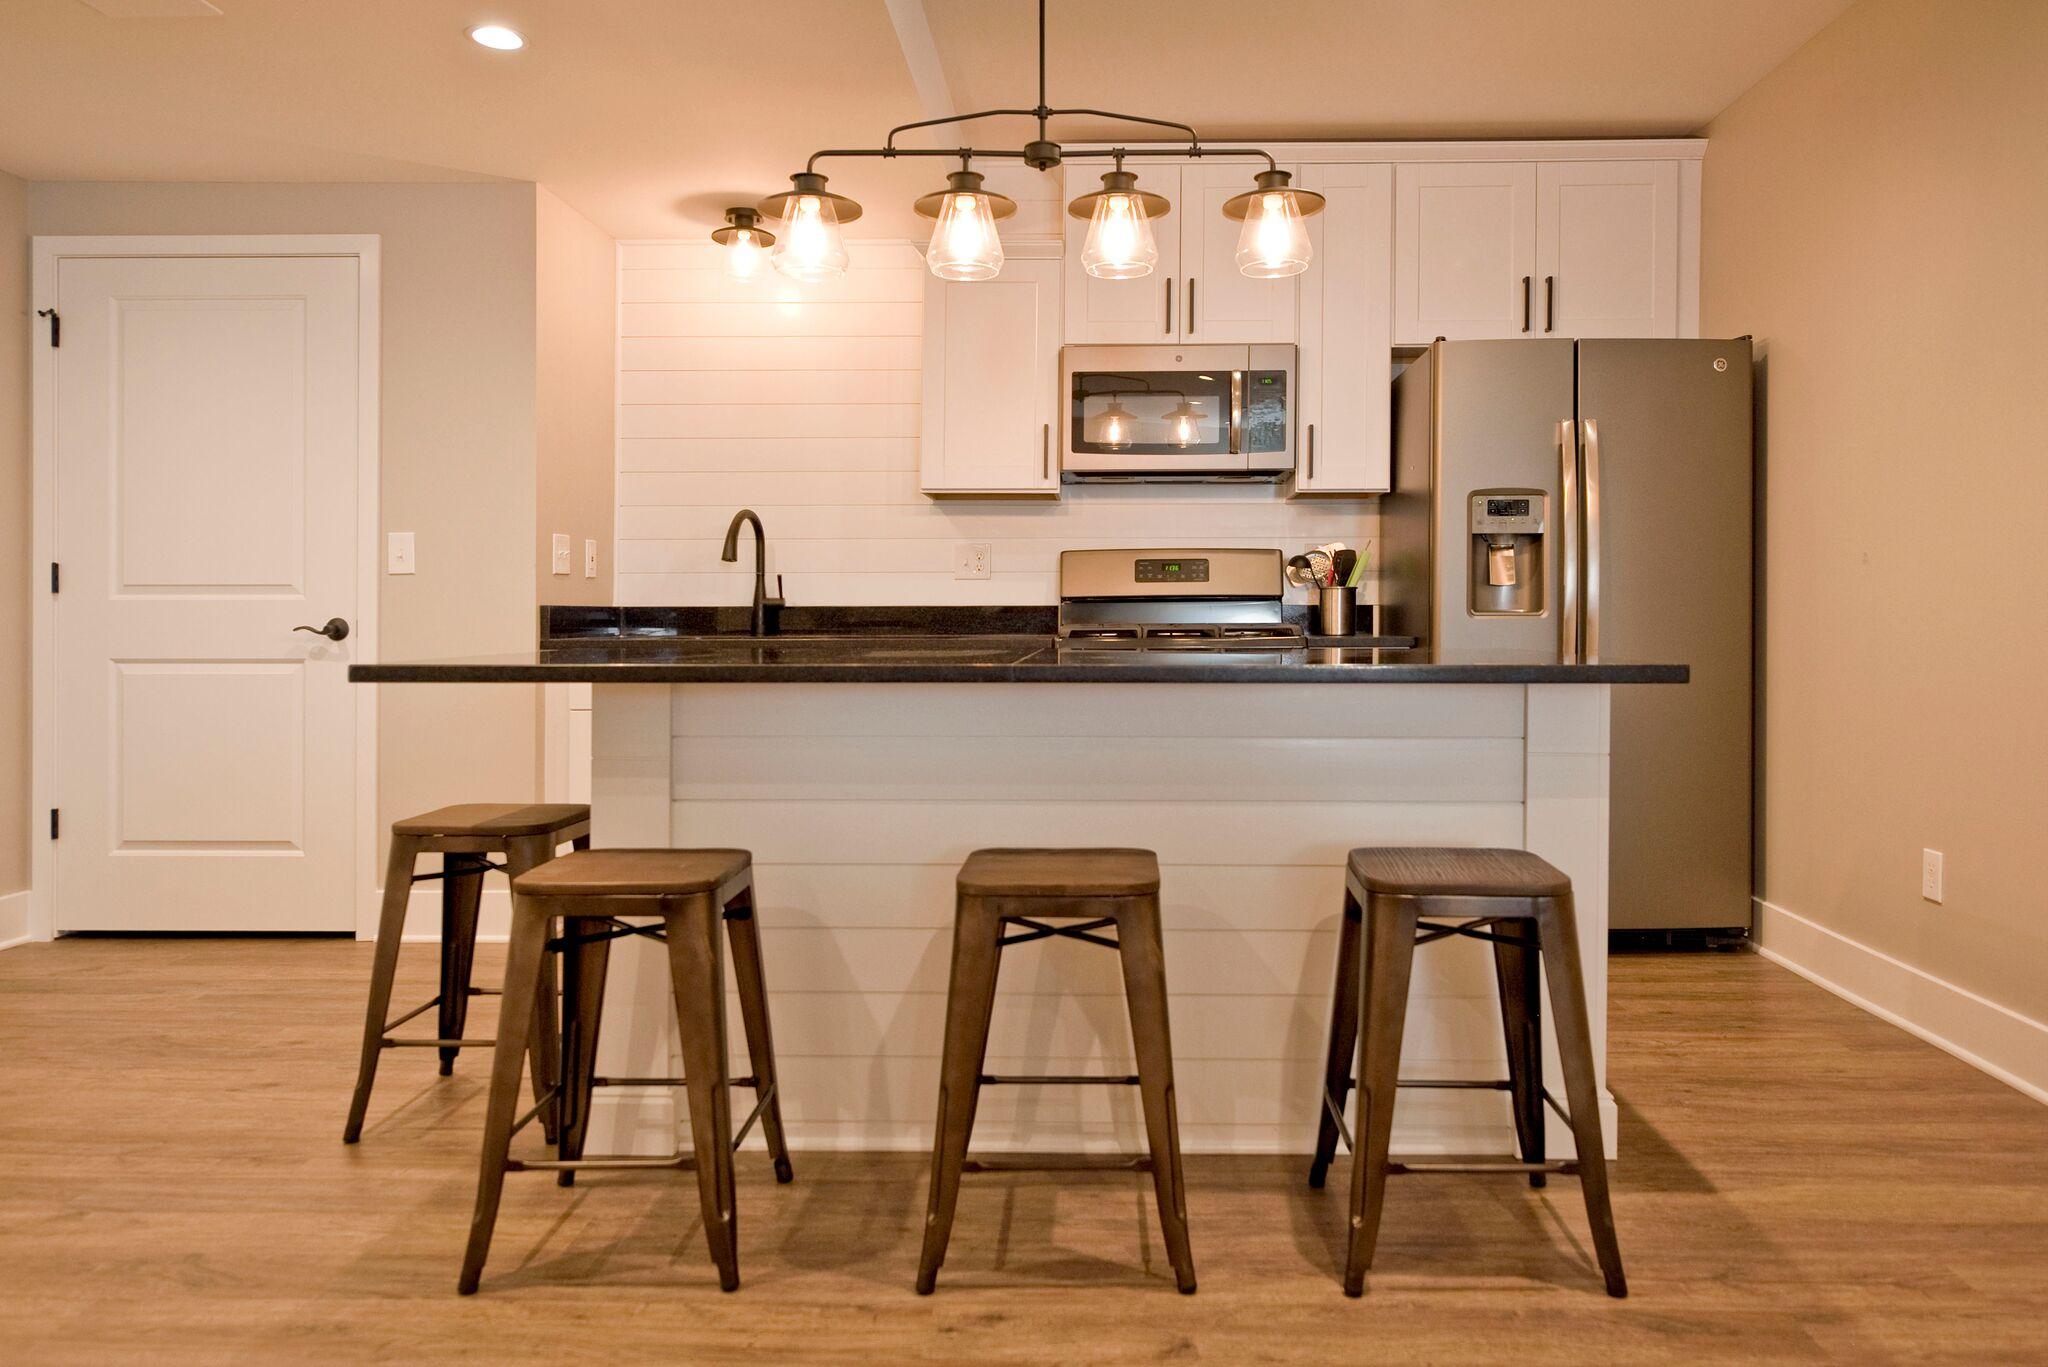 Full Basement Kitchen with Bar